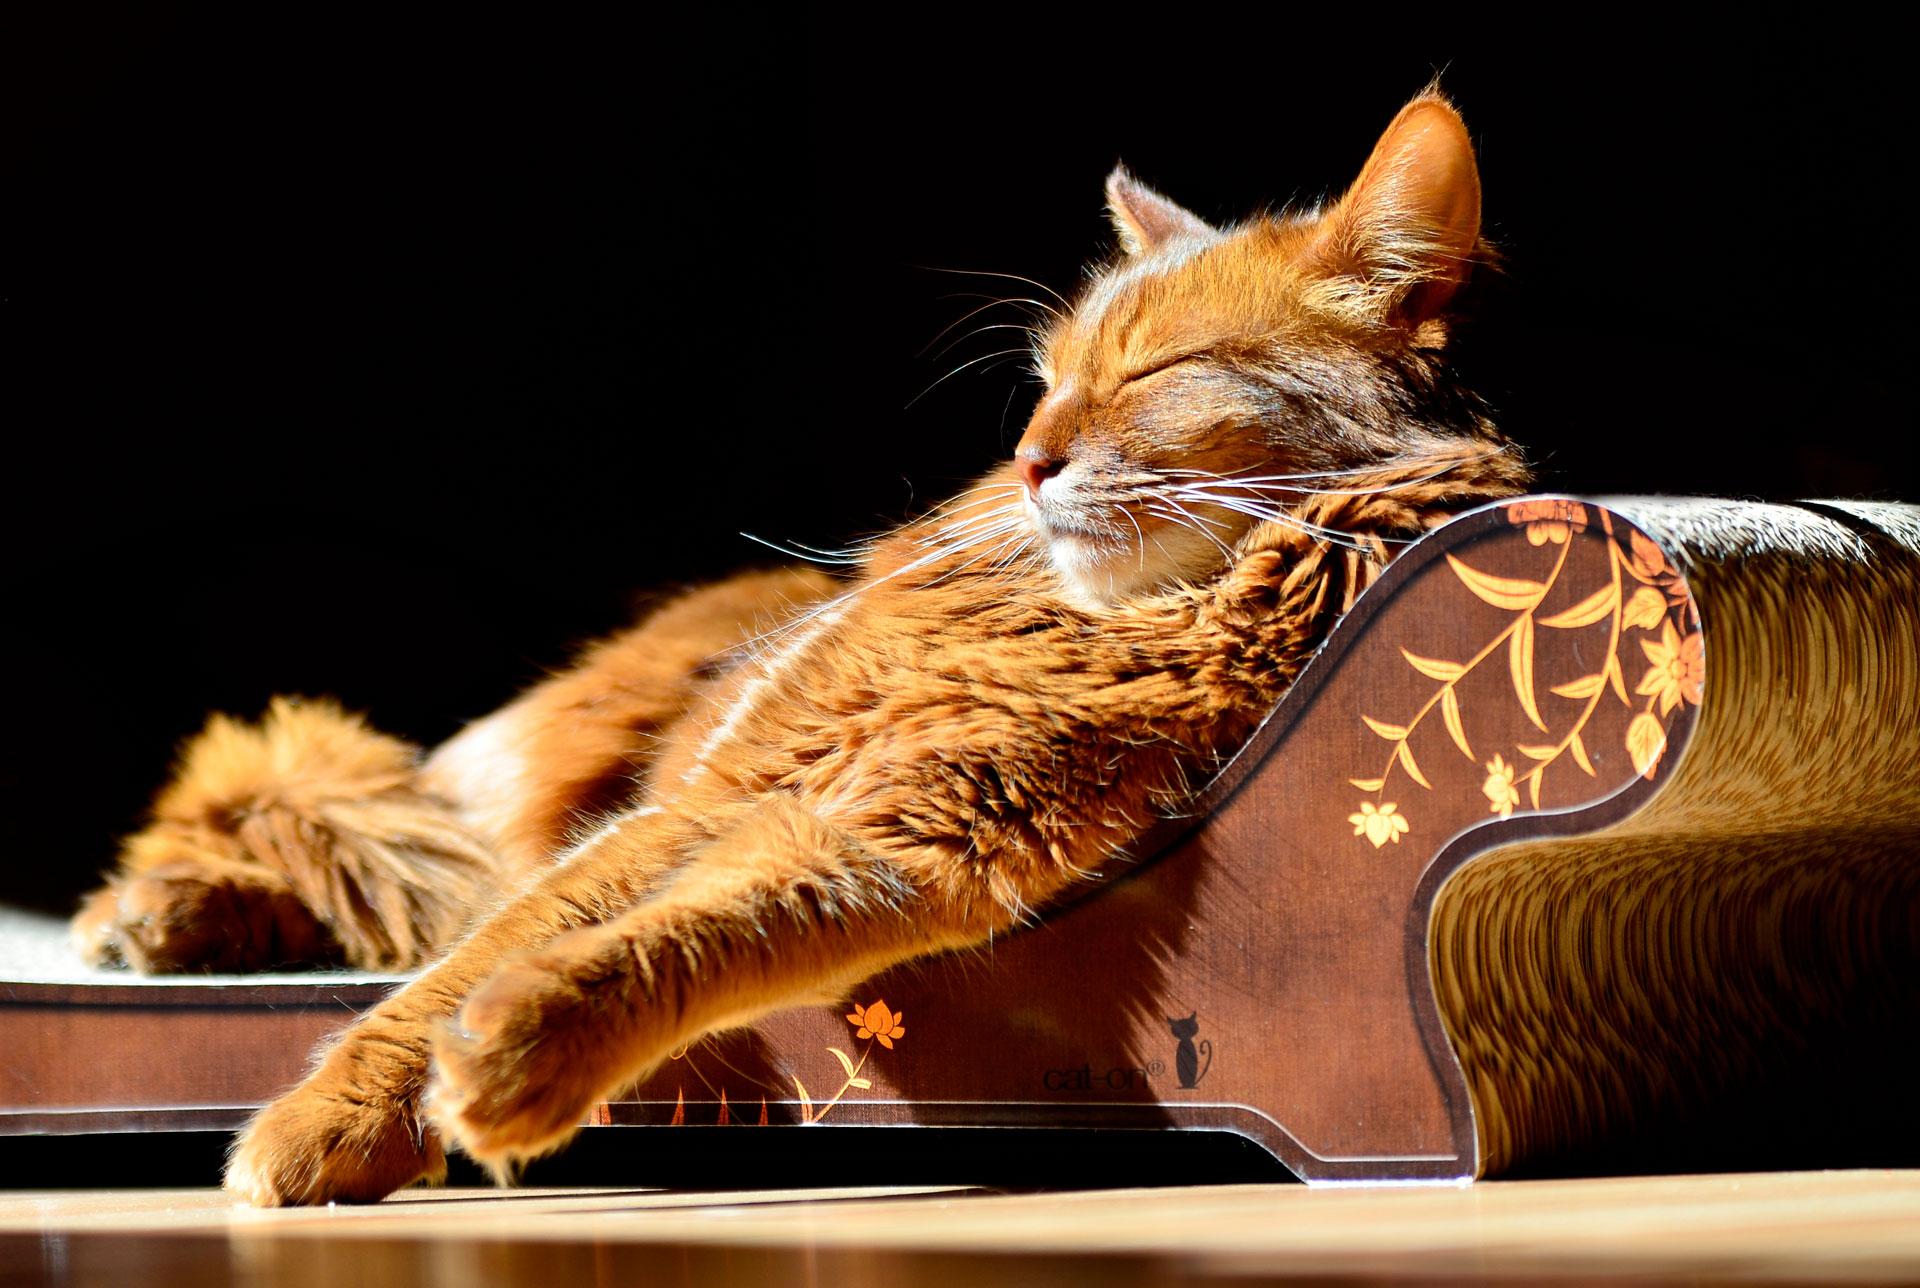 Katzensofa Le Canapé - ergonomisches Kratzbrett für Katzen aus Kratzpappe